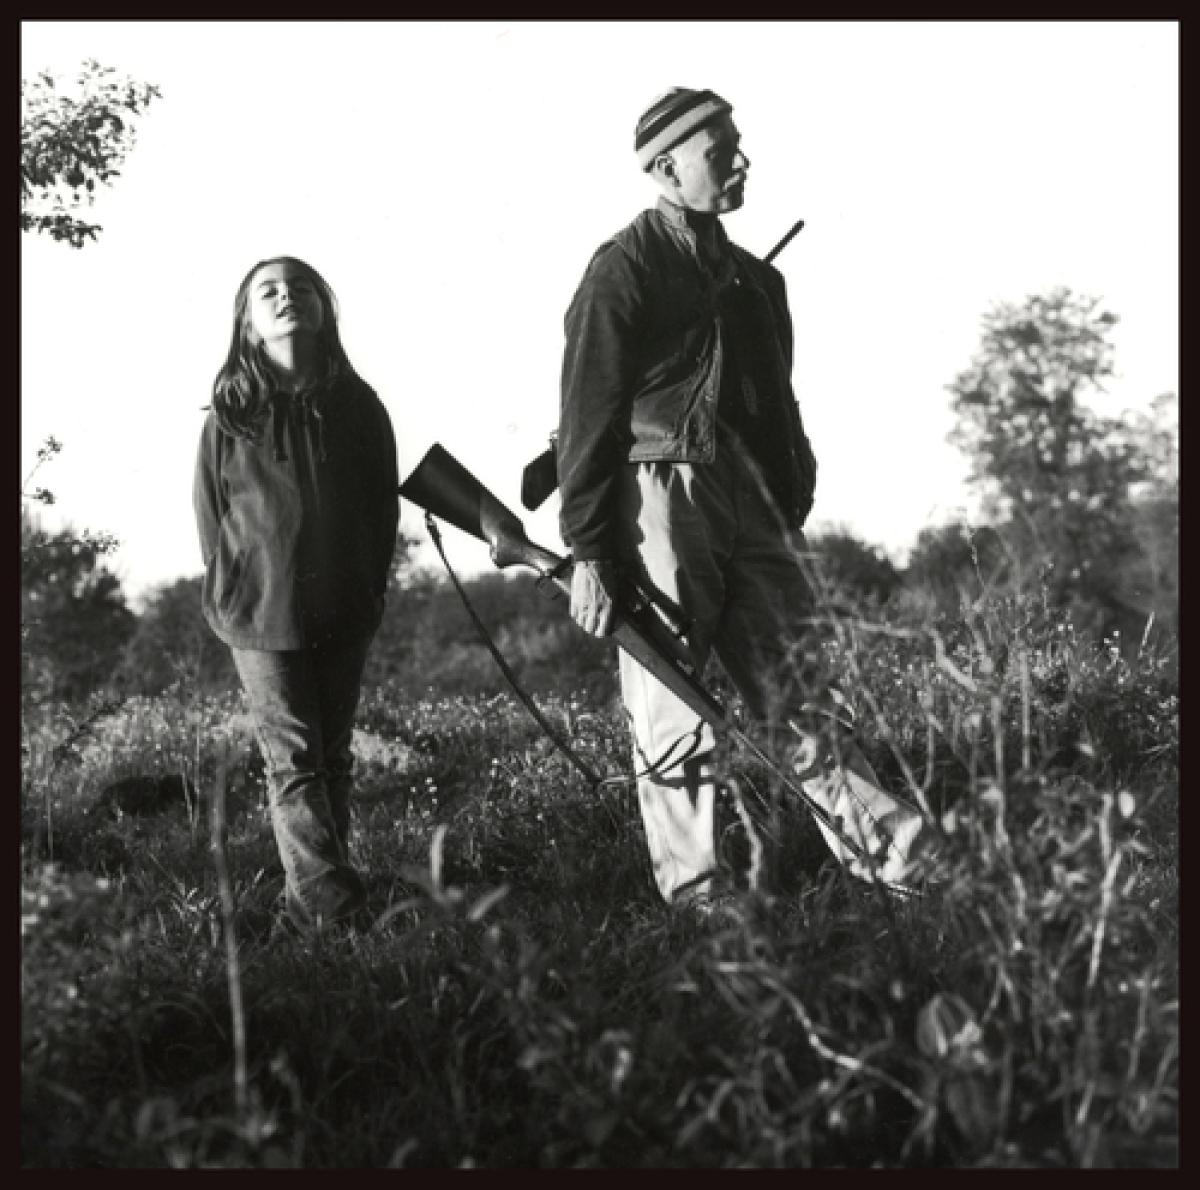 Emily, Monte With Gun, Kearneysville, WV, 2009 (large view)